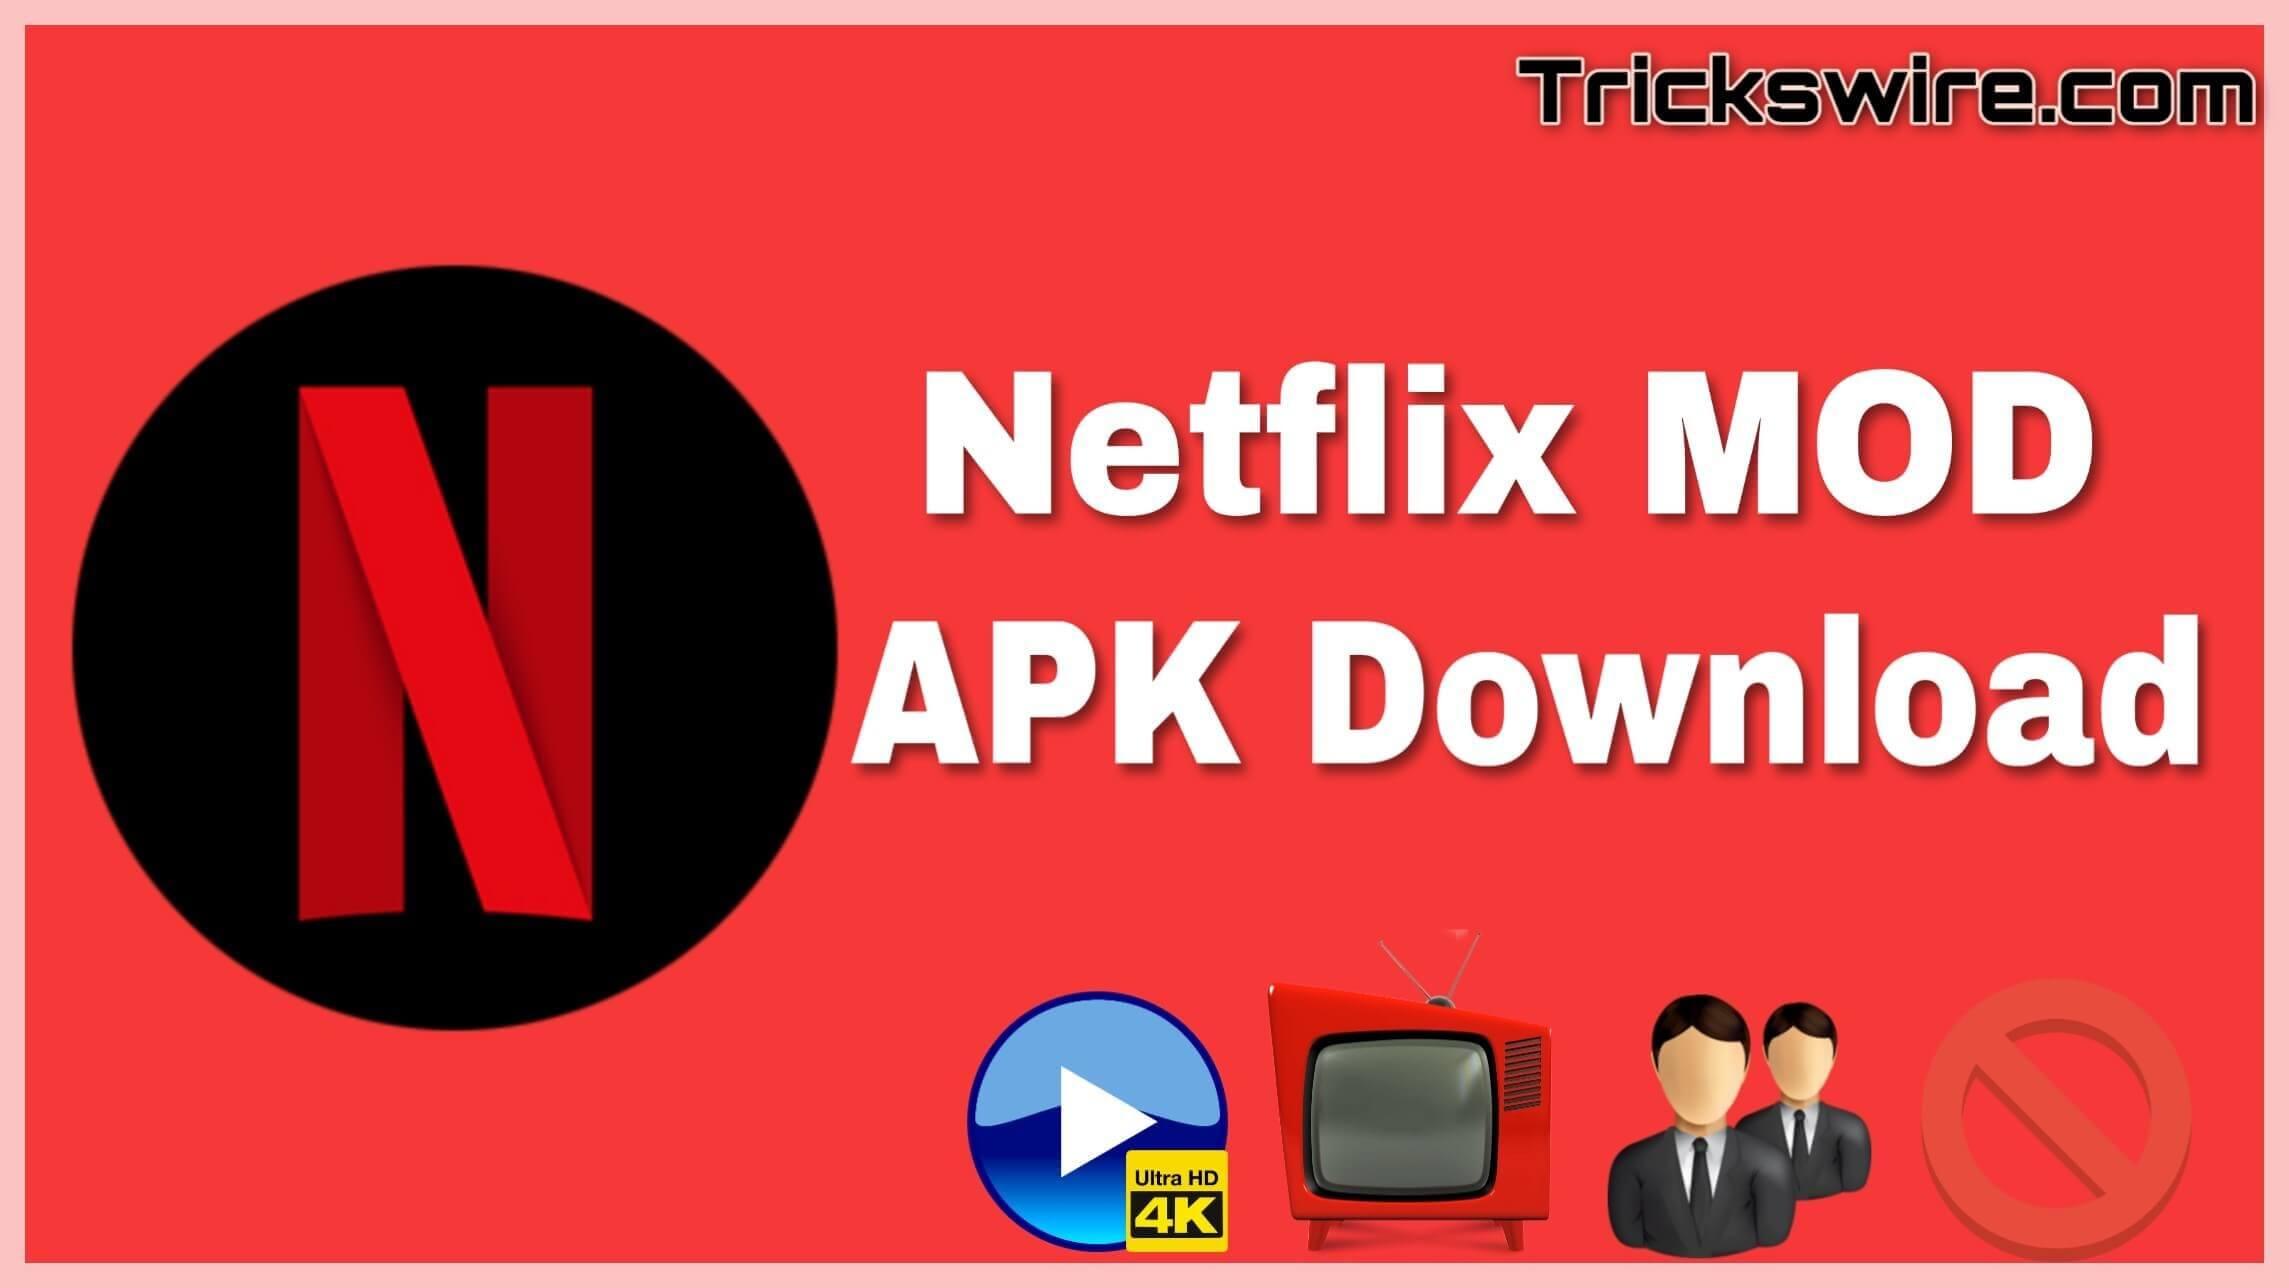 Netflix MOD APK v7.112.0 Download {4k HD, Premium, 100% Working}